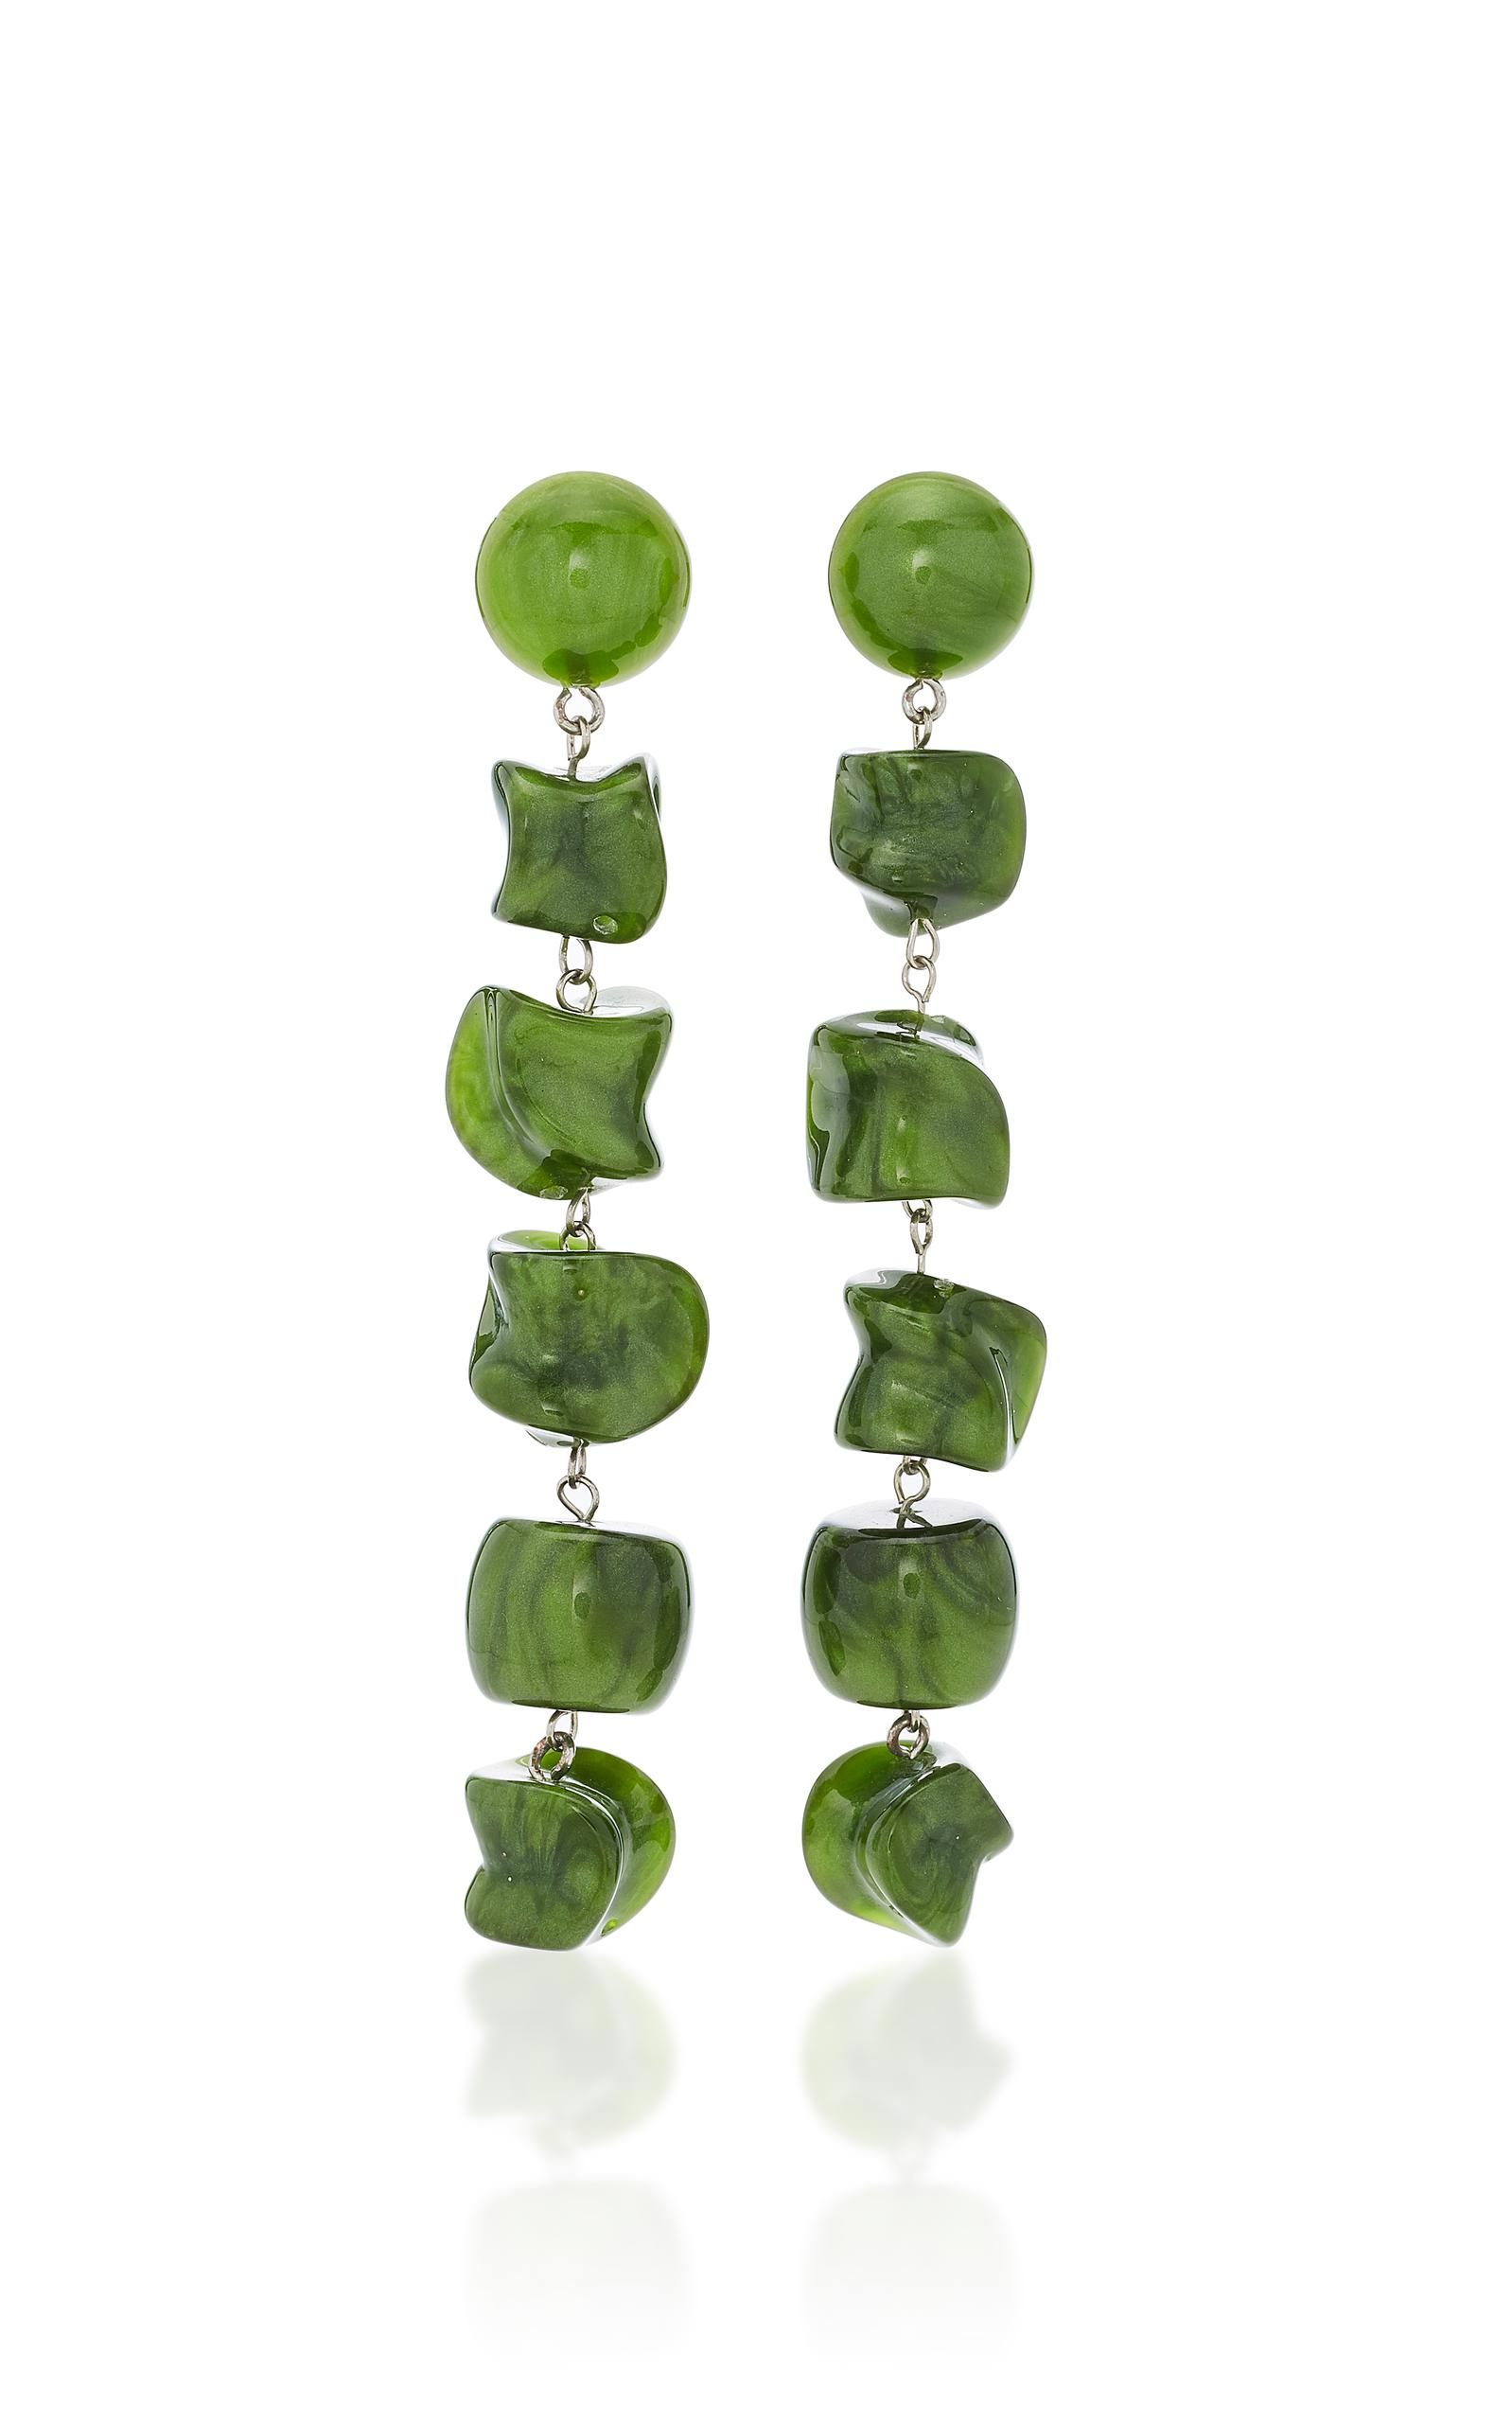 Leo Gold-tone Resin Earrings - Green Cult Gaia chnCInG